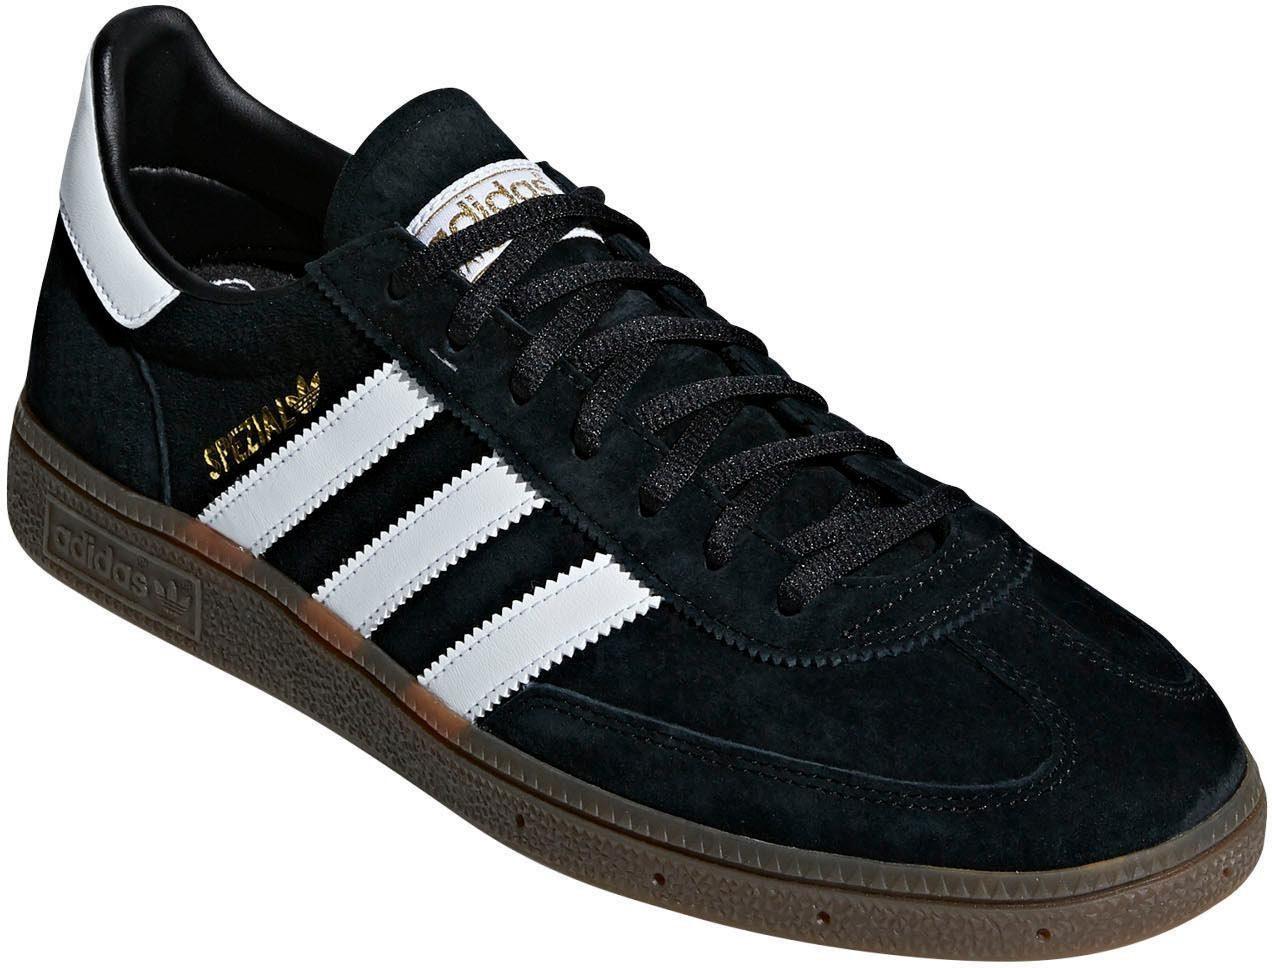 adidas Originals »Handball Spezial« Sneaker kaufen | OTTO